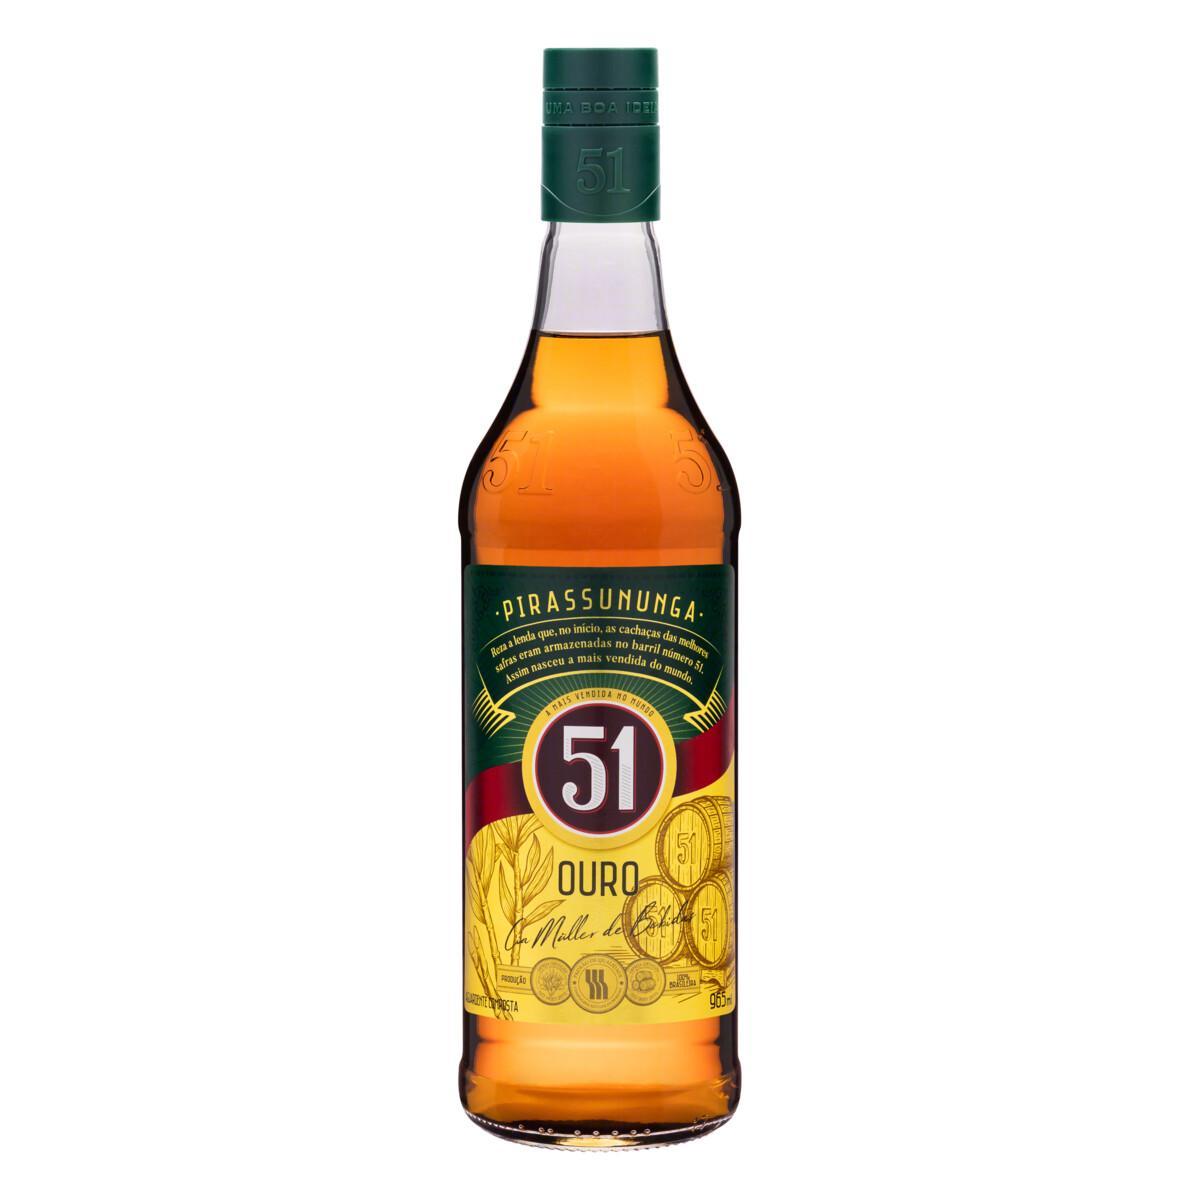 Cachaça Pirassununga Ouro 965ml 51 garrafa UN